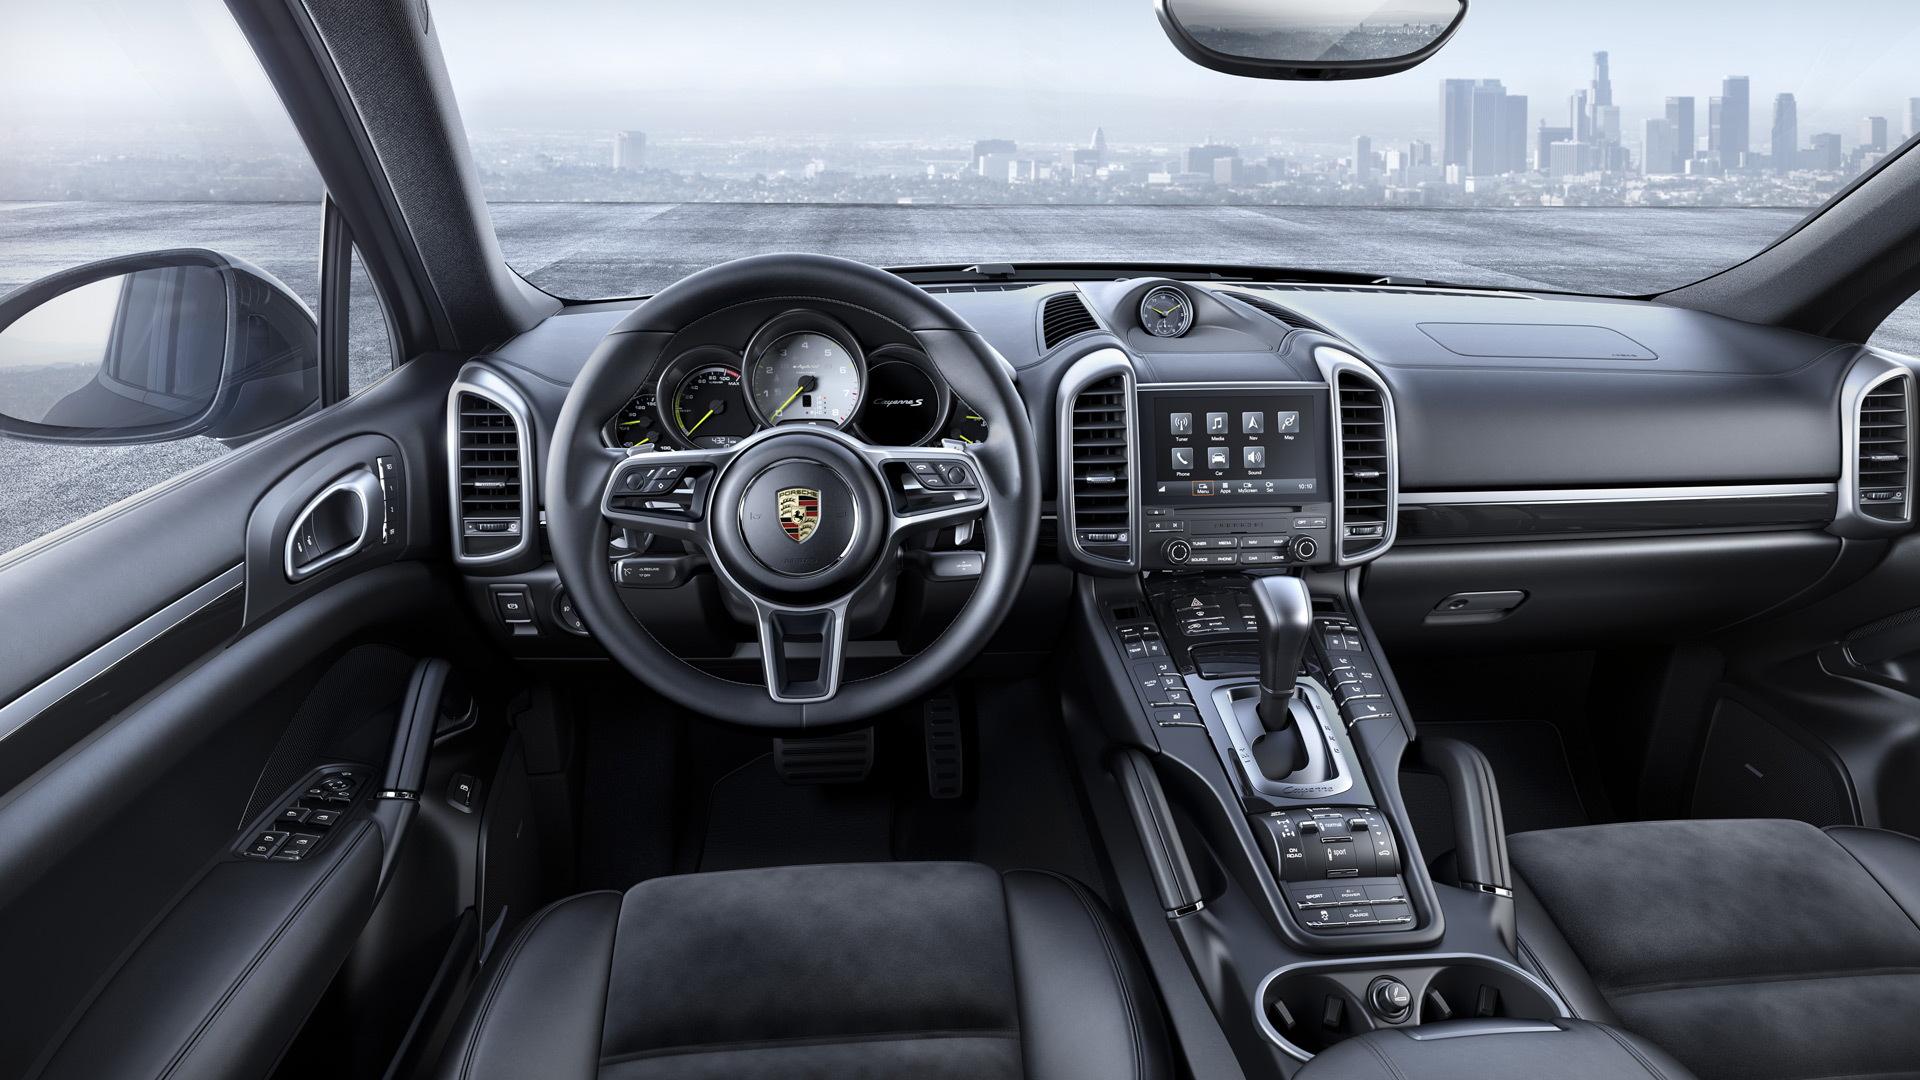 2017 Porsche Cayenne S E Hybrid Platinum Edition